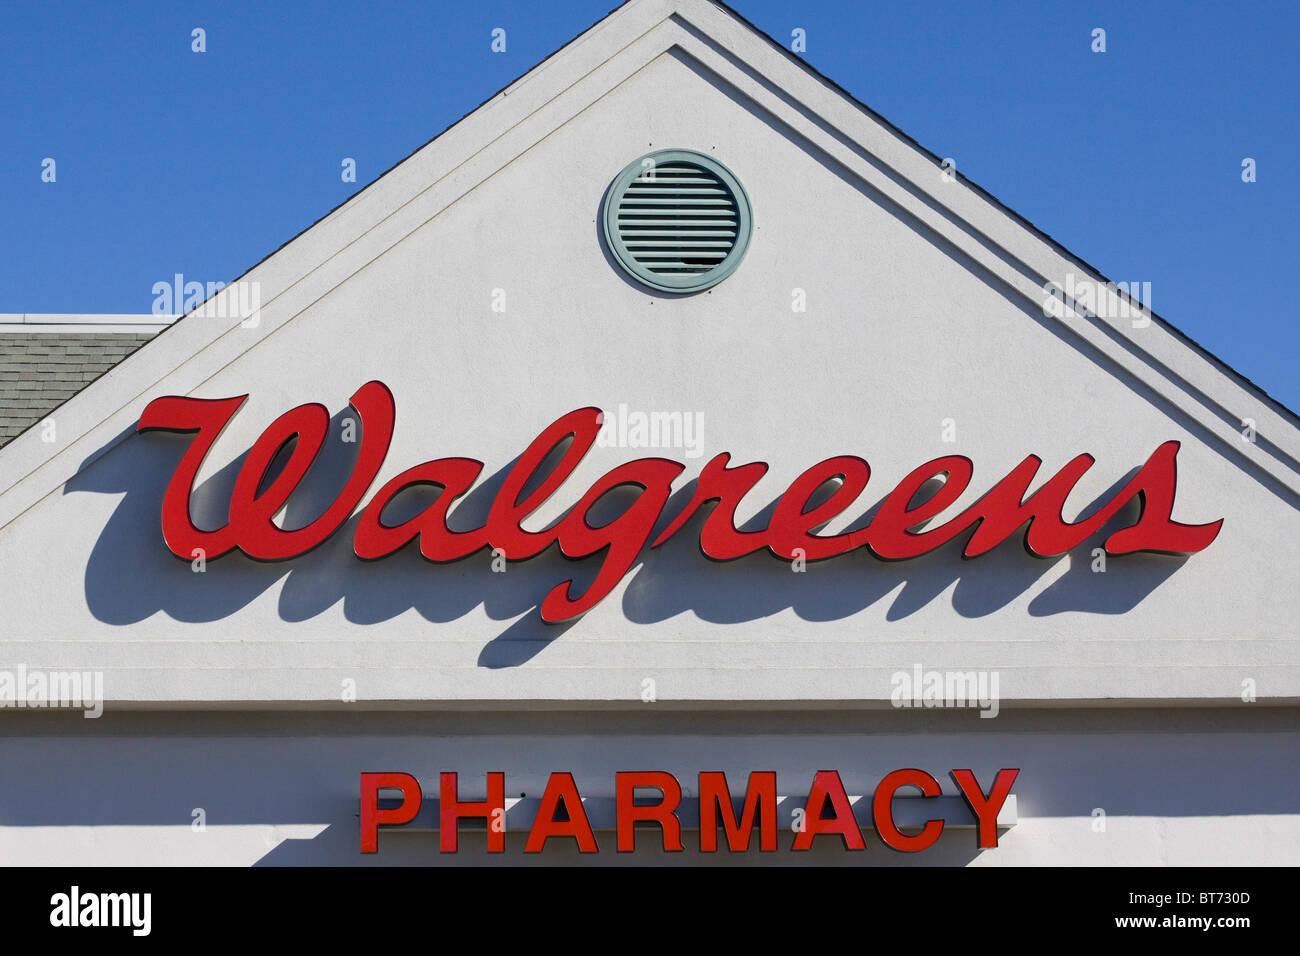 walgreens drugstore stock photos  u0026 walgreens drugstore